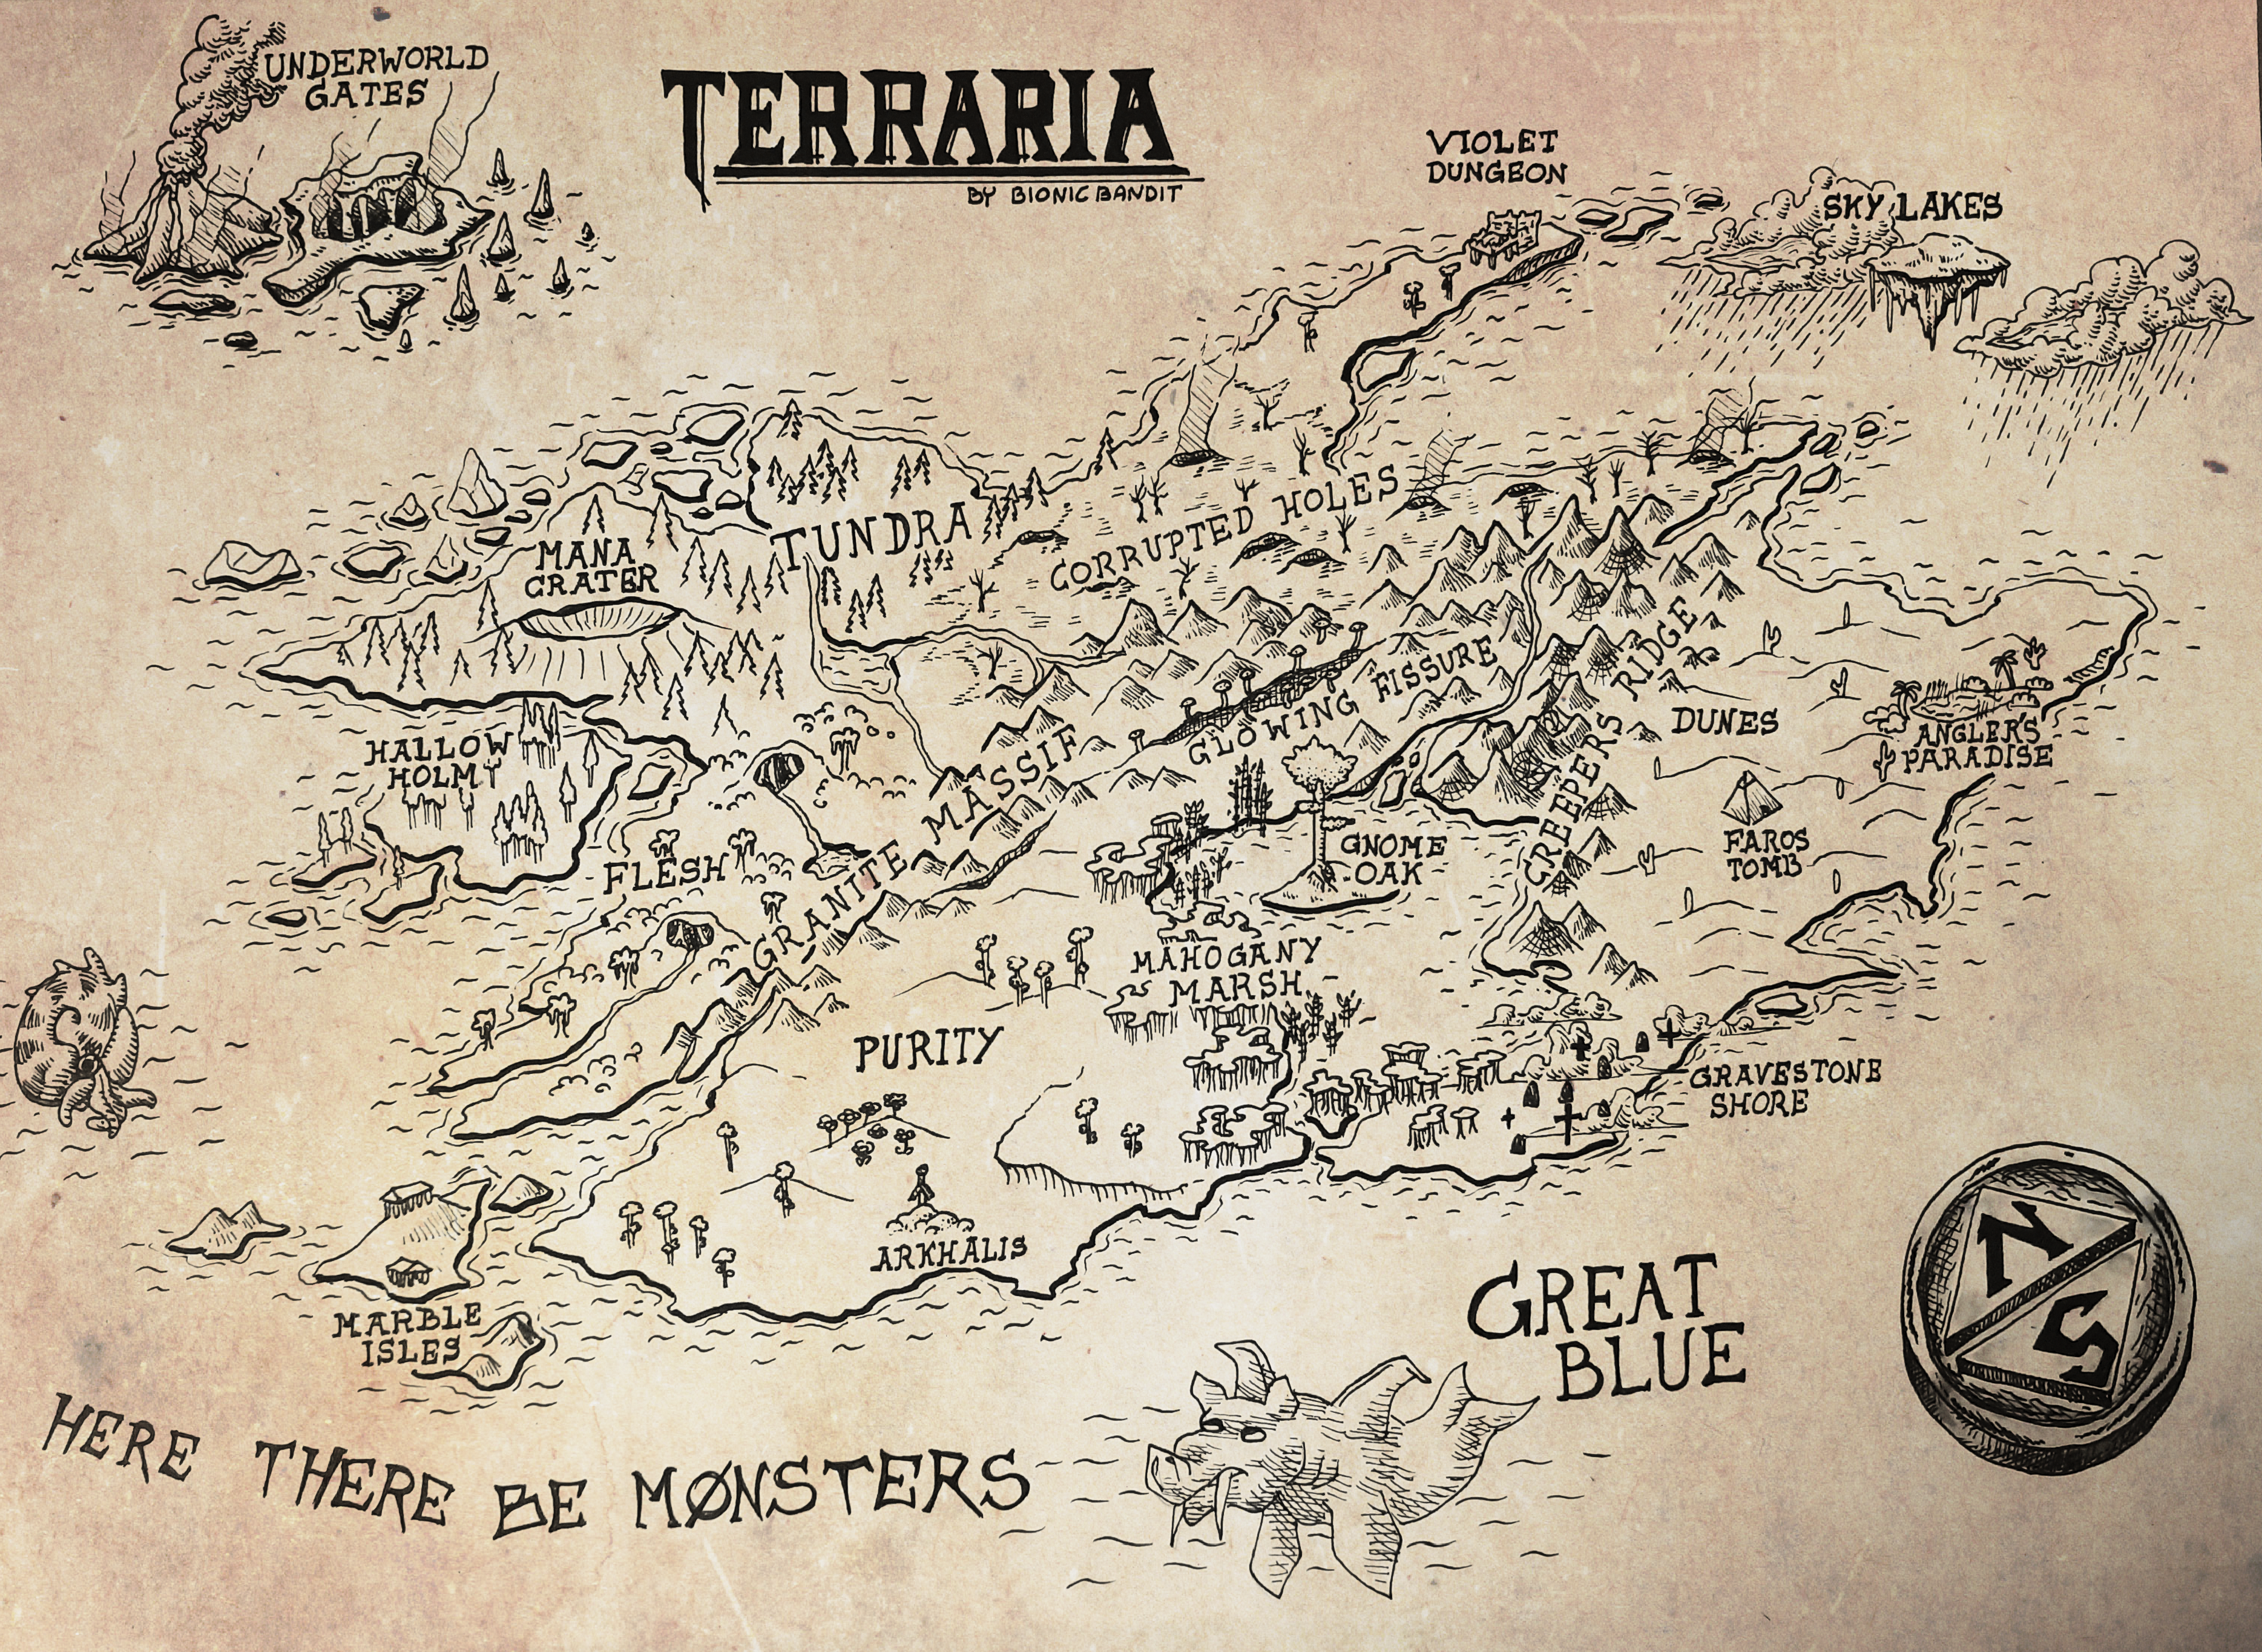 terraria map.png